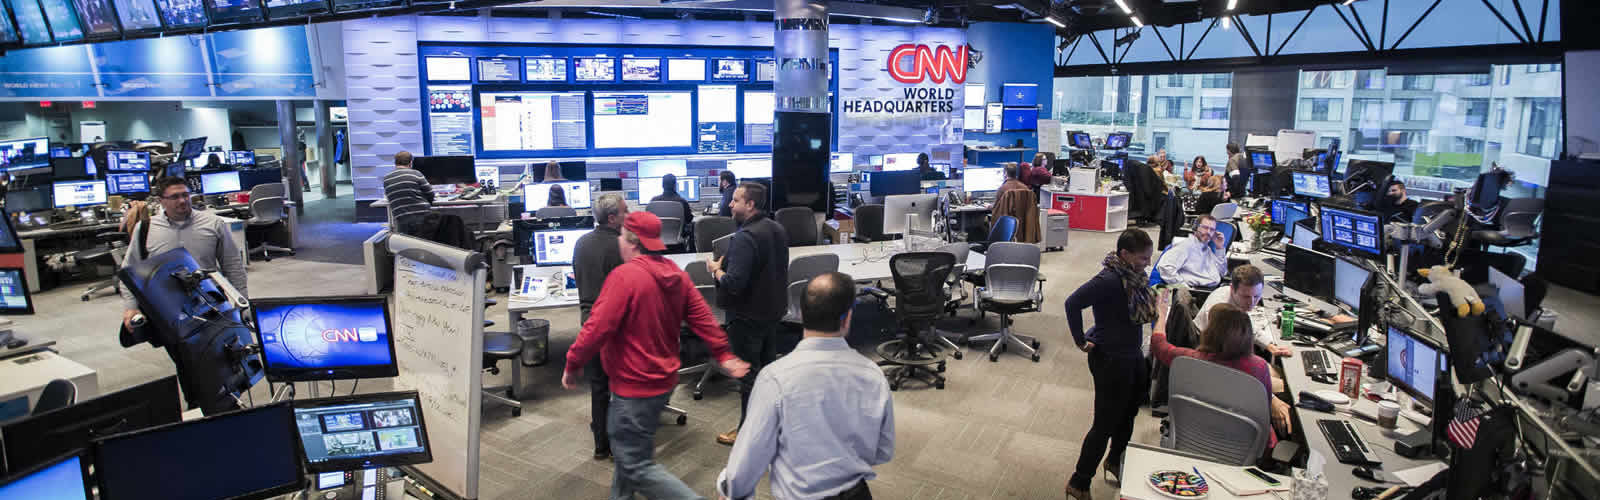 inside-cnn-studio-tour-visite-chaine-television-une